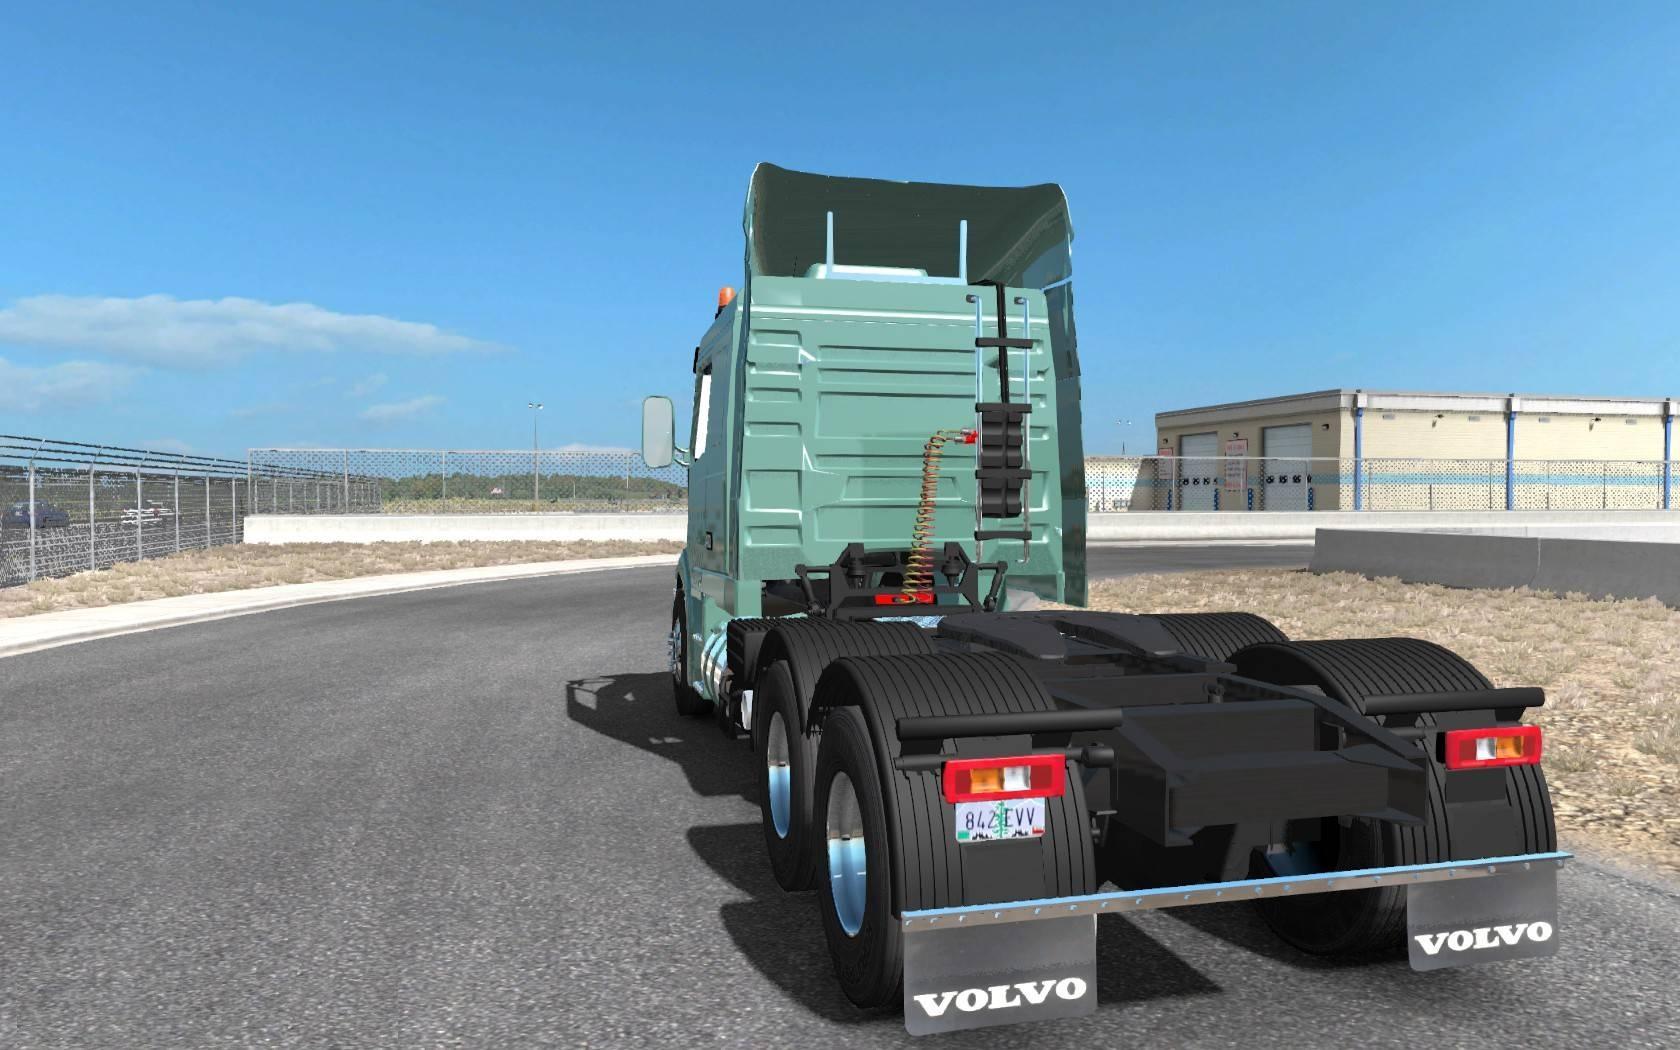 Volvo Dealers Nh >> Ats Volvo Nh12 1 32 X Ats Mods American Truck Simulator